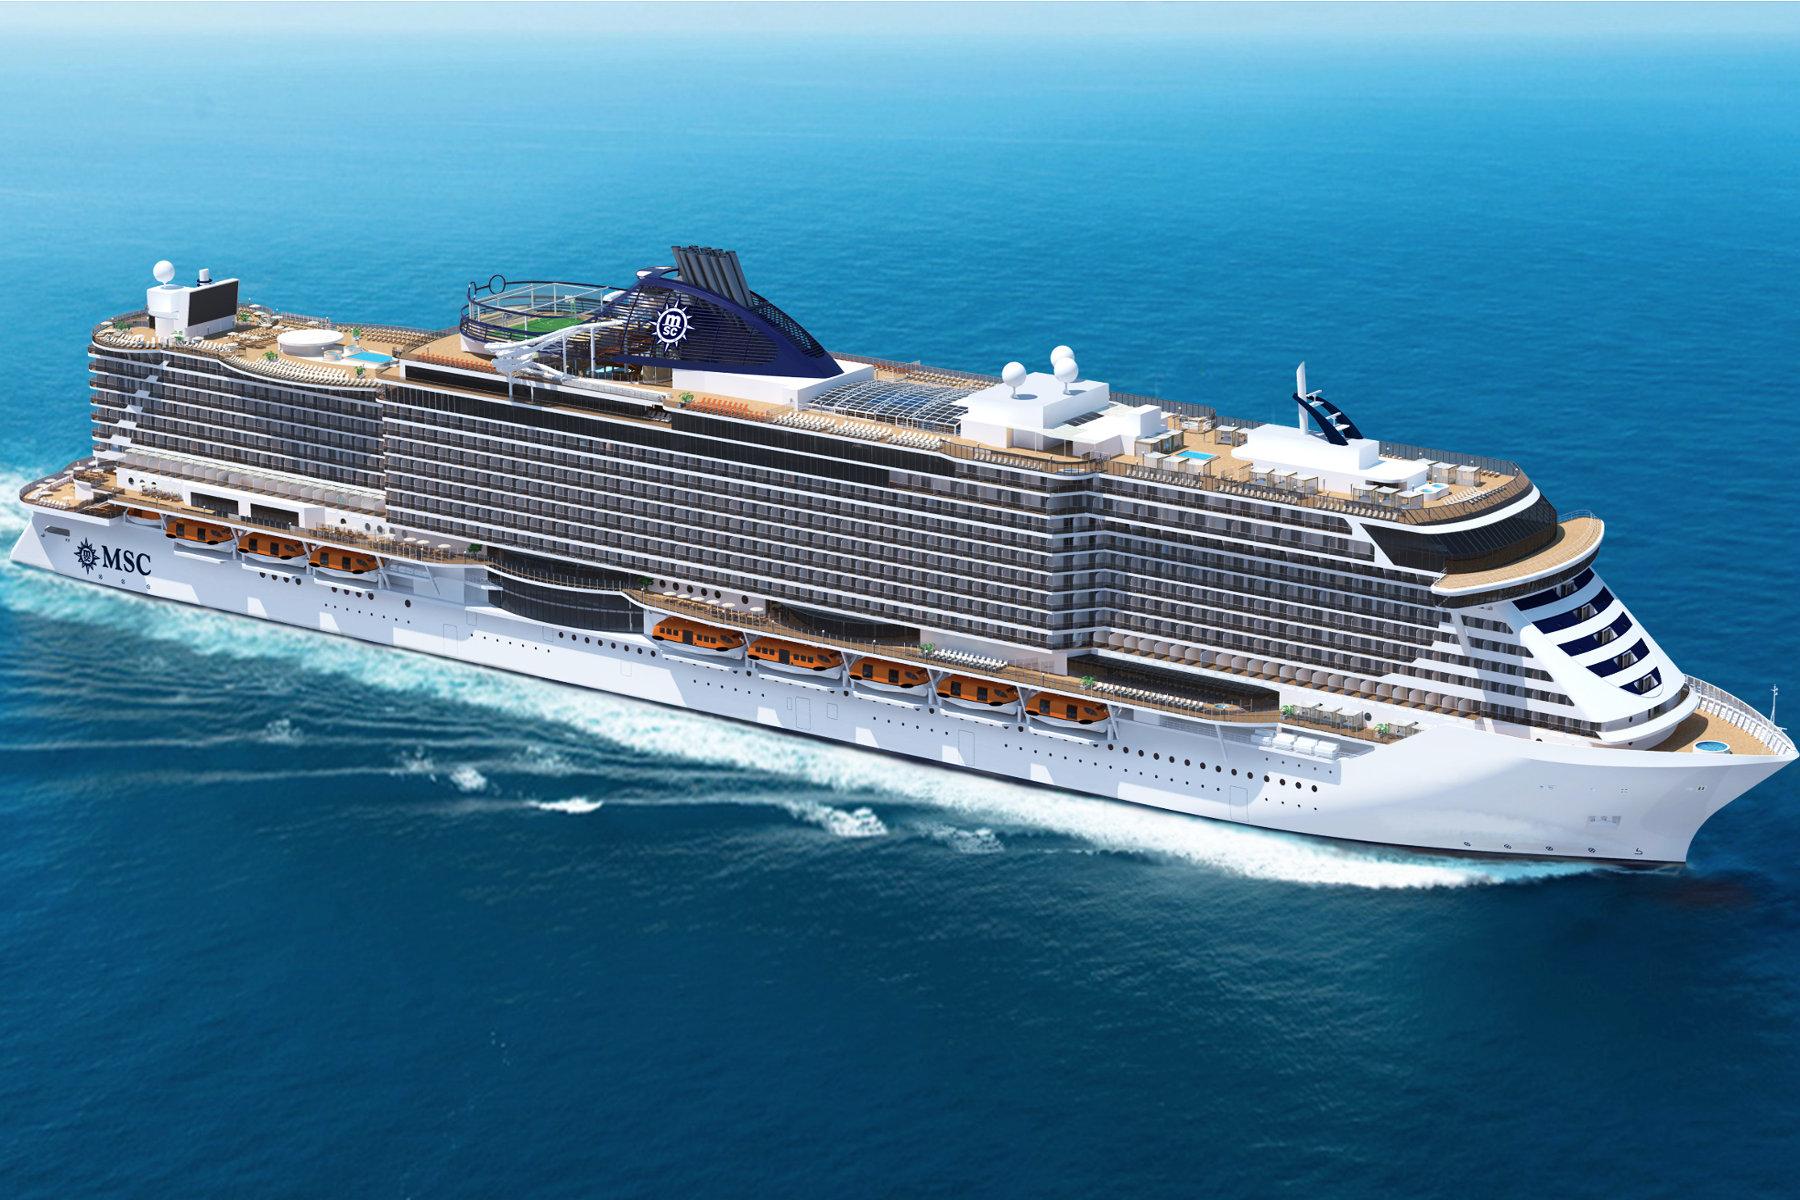 Croaziera in USA,Antilele Olandeze,Martinique,Grenada,Curacao,Aruba si Bahamas la bordul navei MSC Meraviglia - 12 nopti